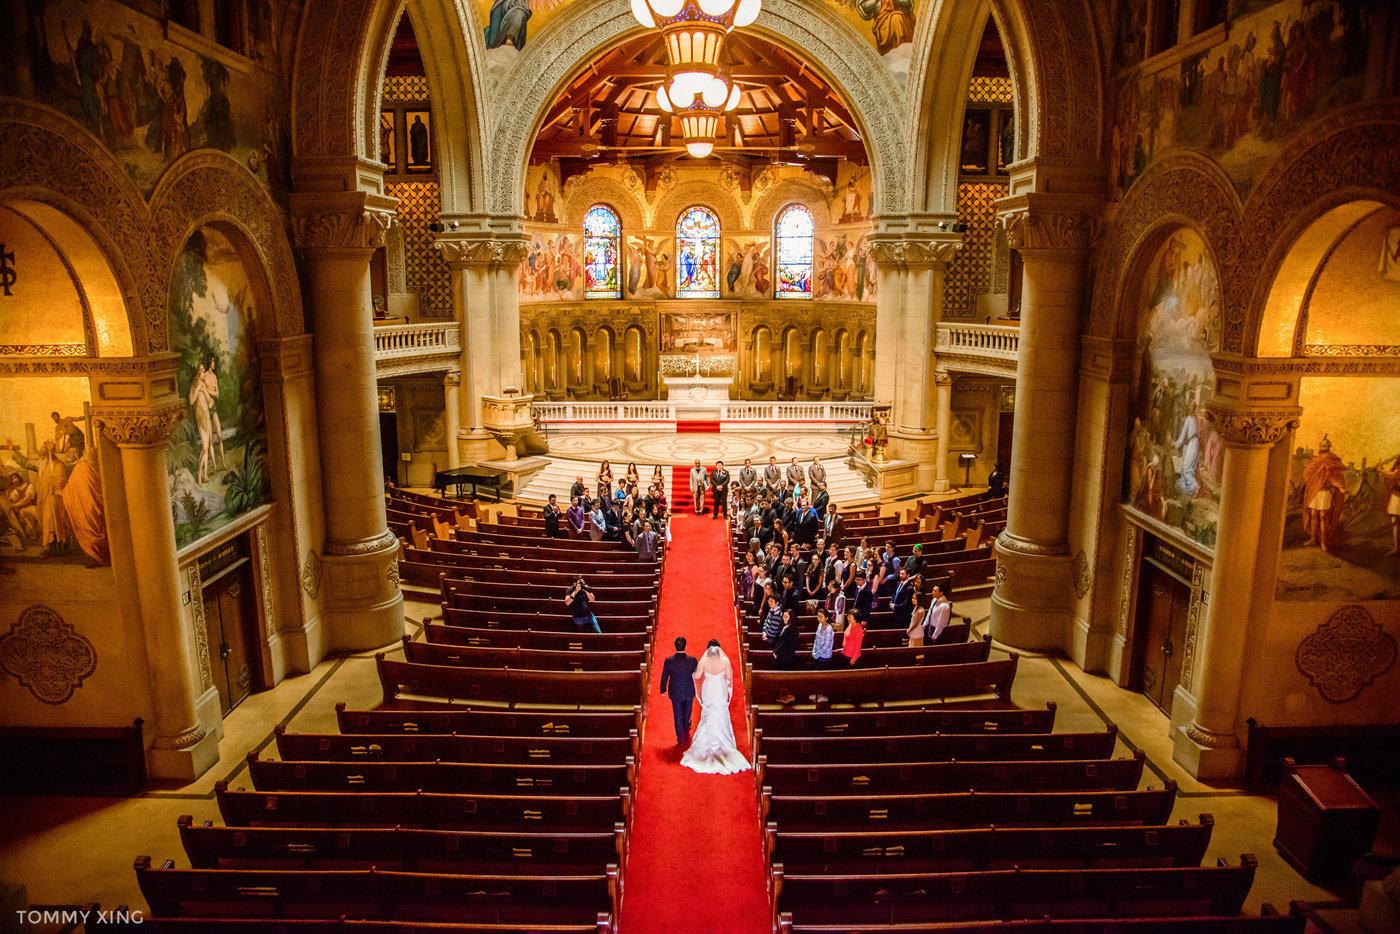 STANFORD MEMORIAL CHURCH WEDDING - Wenjie & Chengcheng - SAN FRANCISCO BAY AREA 斯坦福教堂婚礼跟拍 - 洛杉矶婚礼婚纱照摄影师 Tommy Xing Photography075.jpg